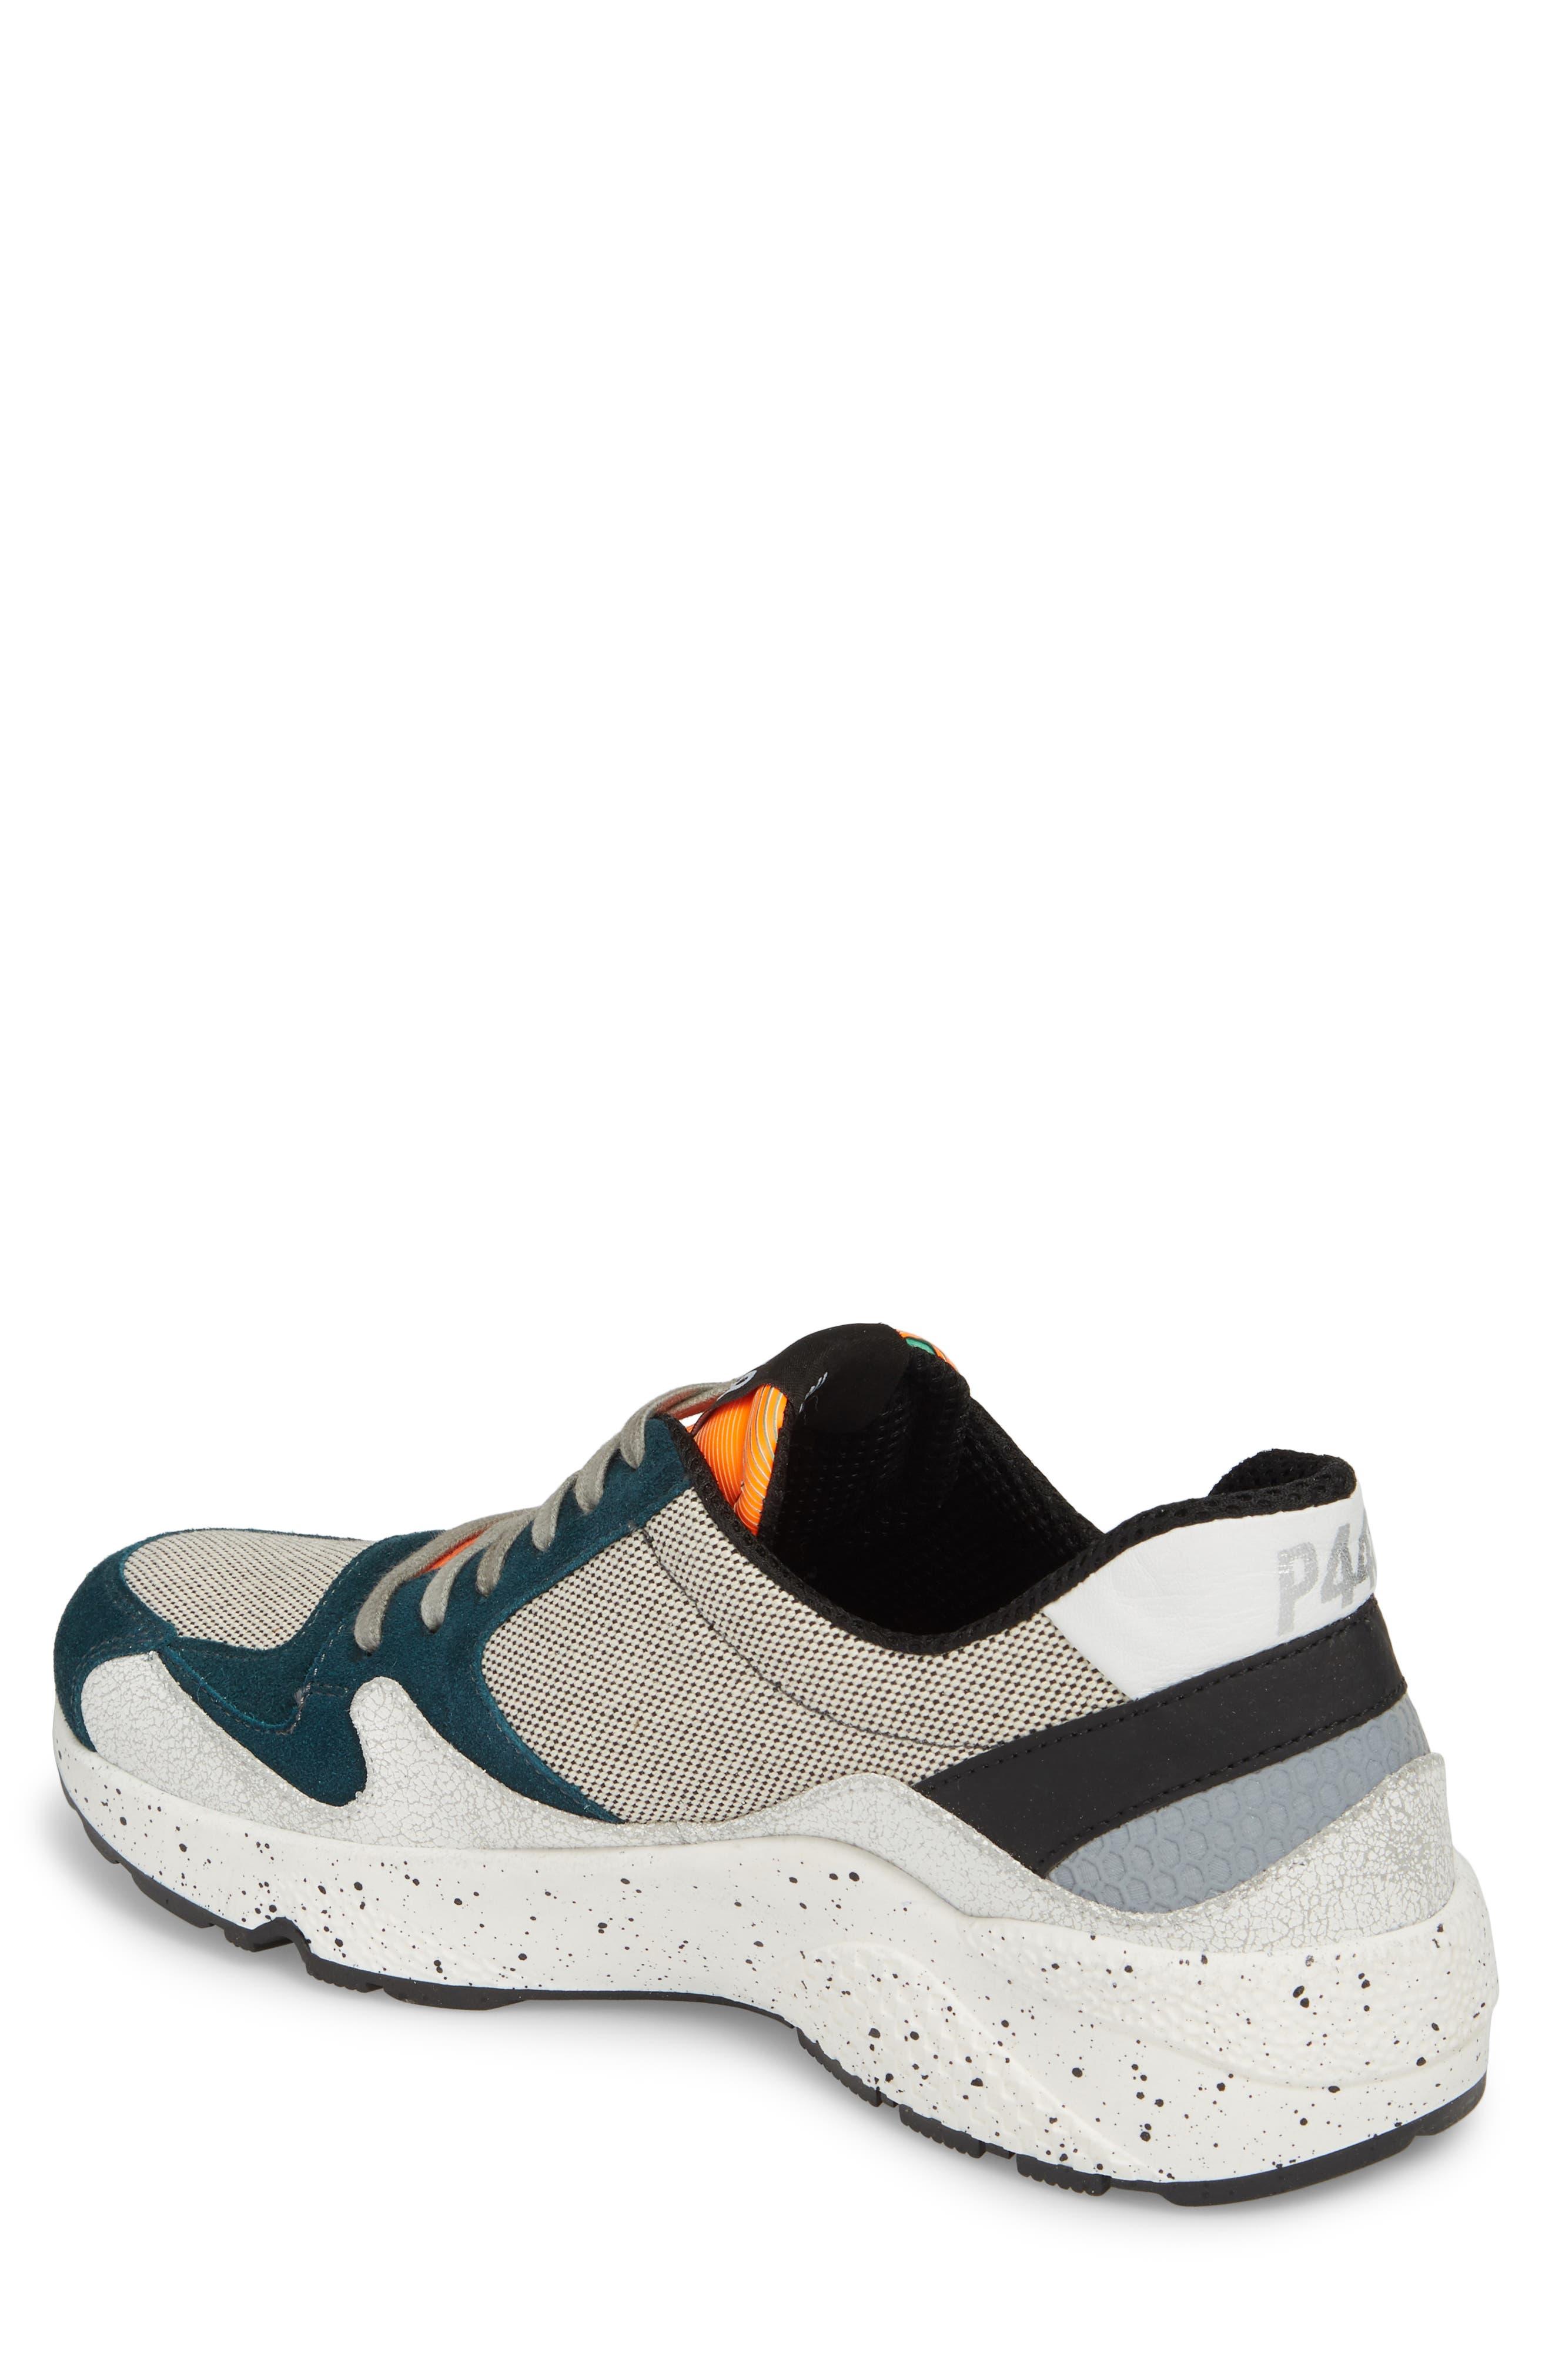 America Low Top Sneaker,                             Alternate thumbnail 2, color,                             White